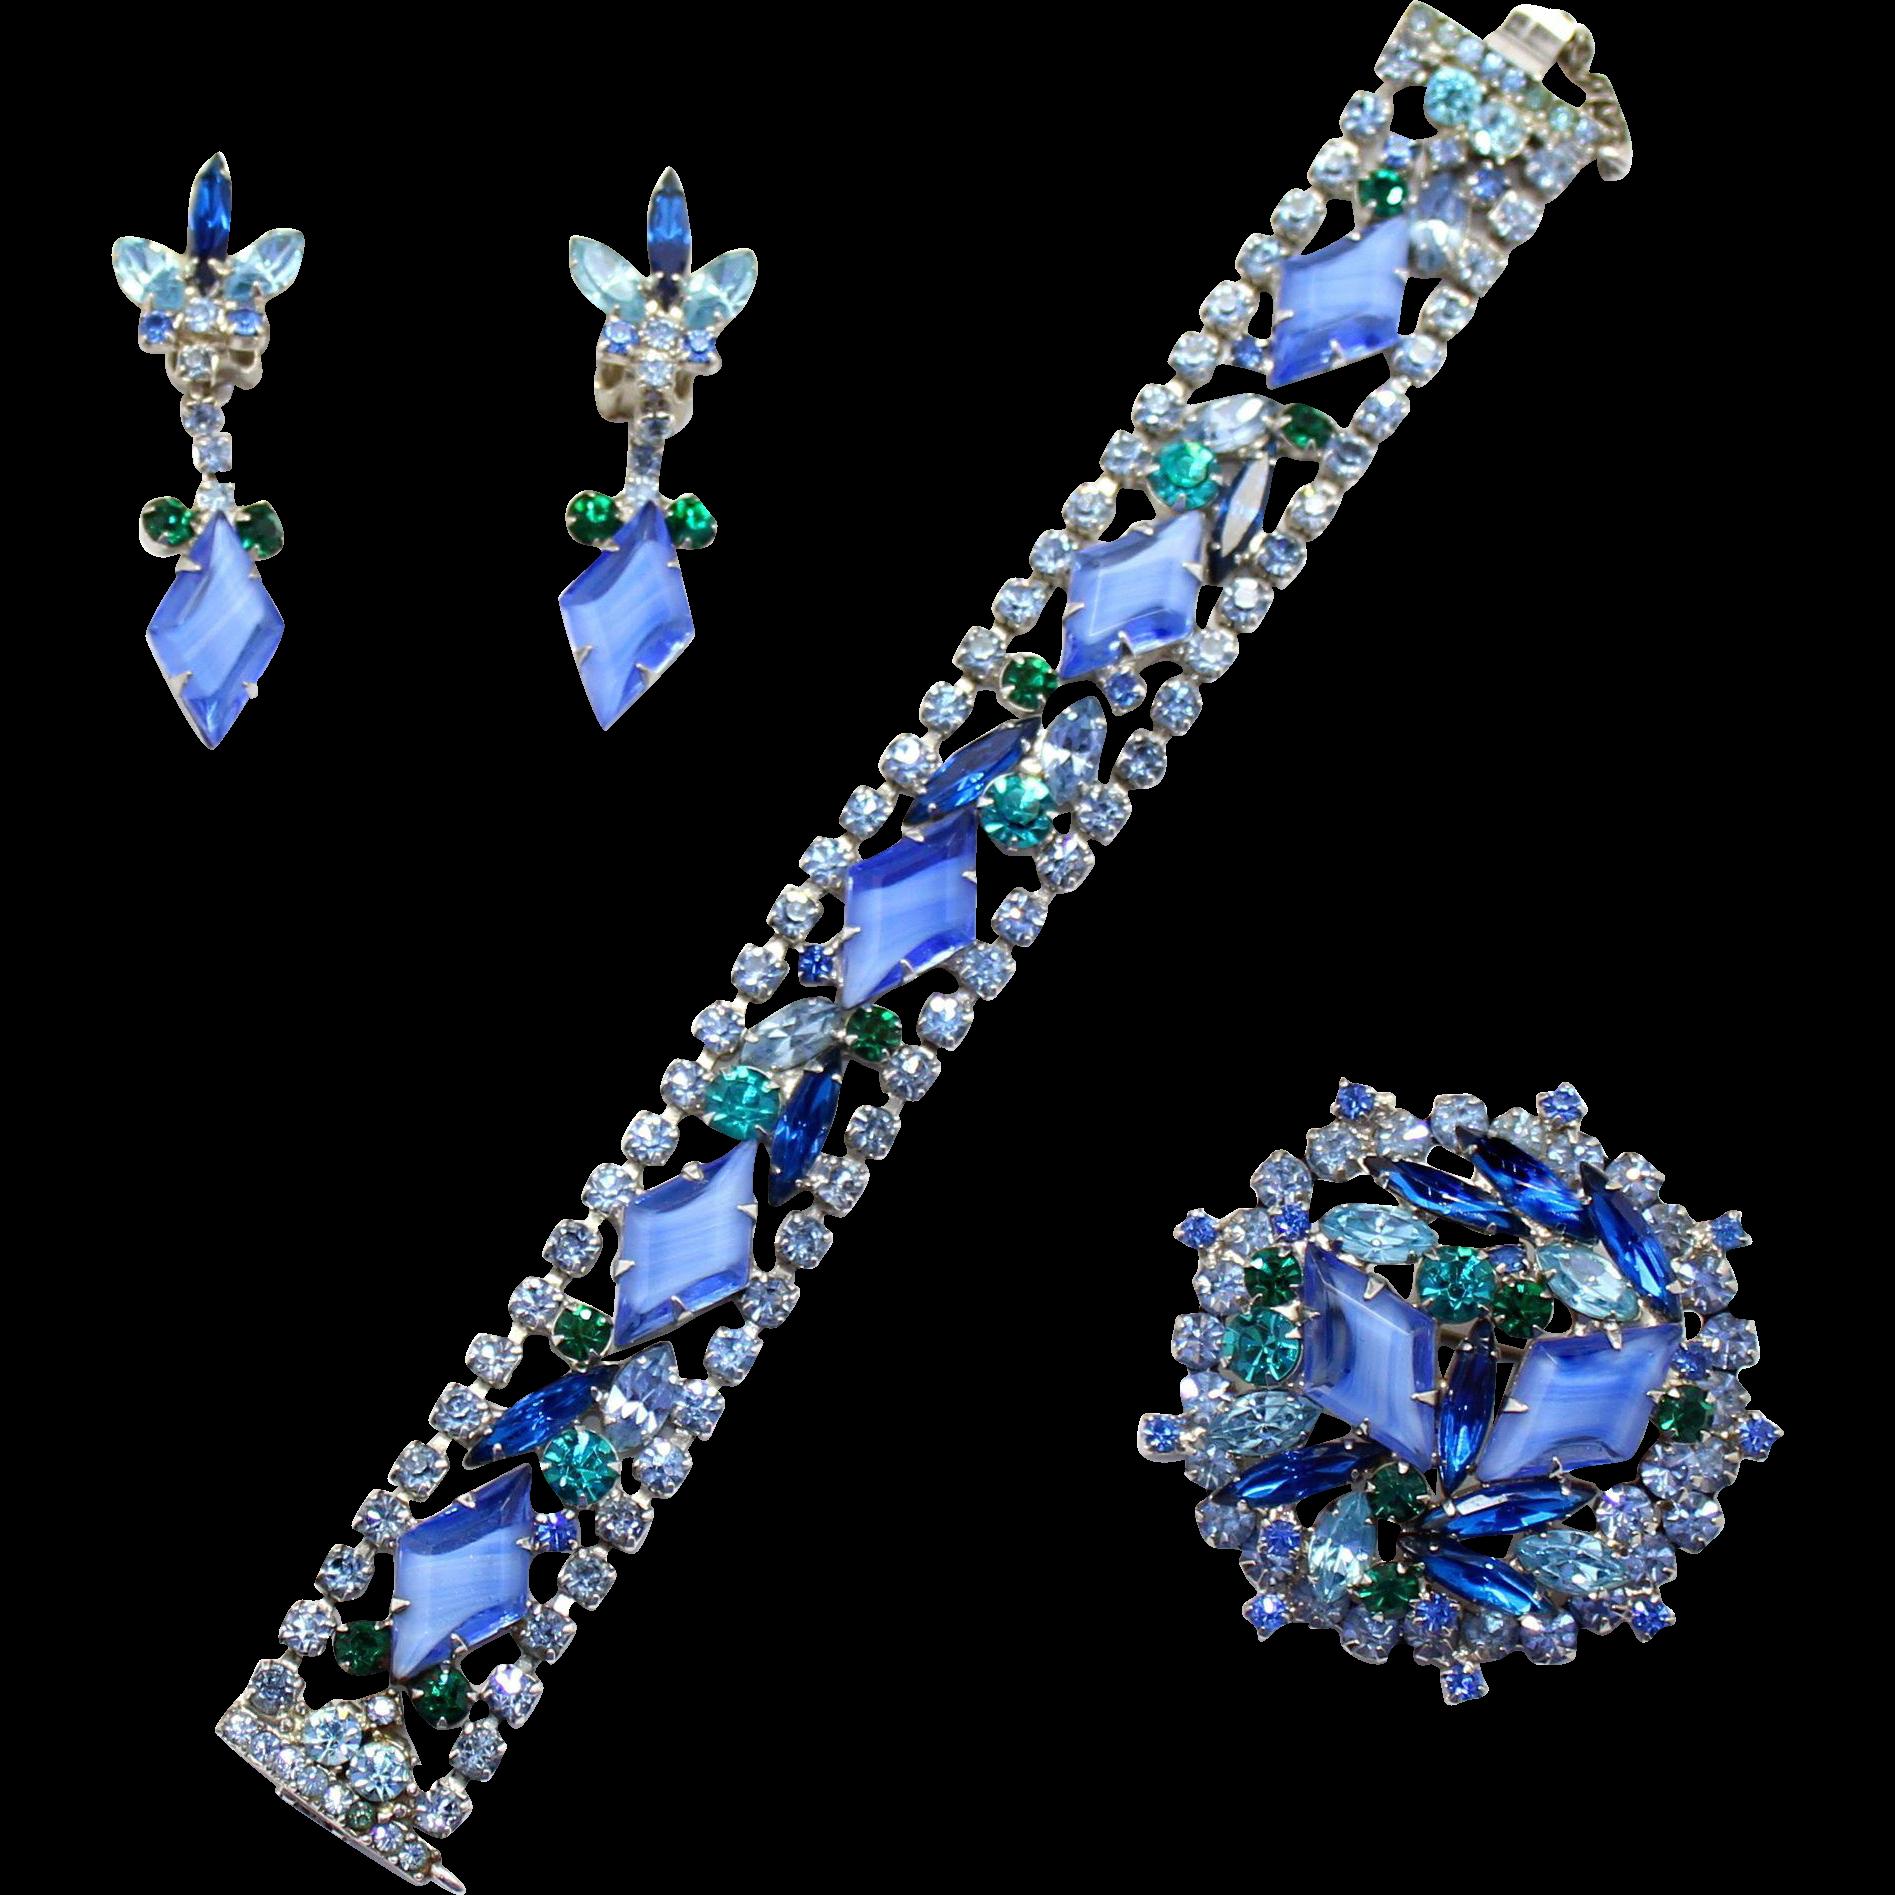 Vintage Juliana (D and E) Book Piece Blue Diamond Givre, Teal and Blue Zircon Rhinestone Bracelet, Brooch and Dangle Earrings Parure